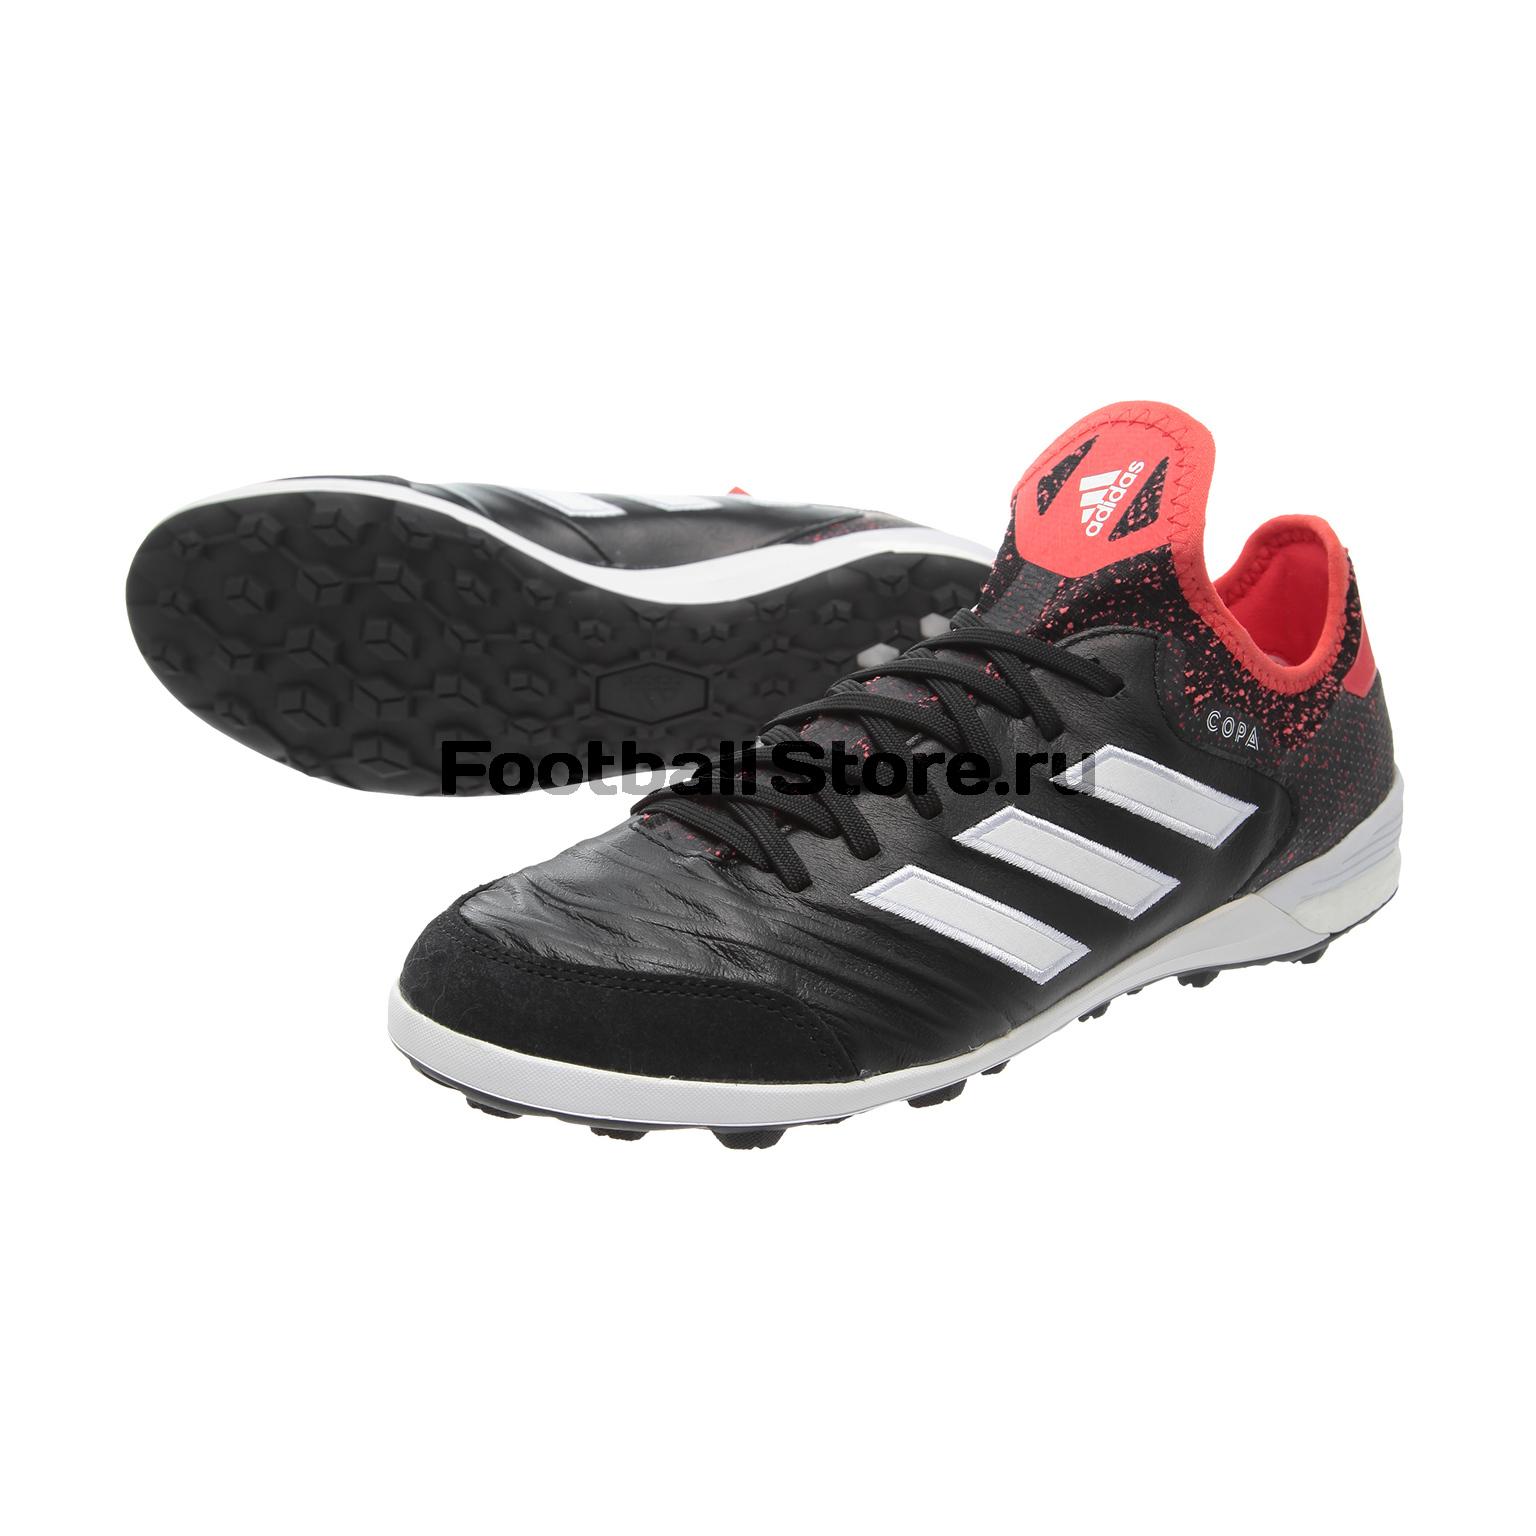 Шиповки Adidas Copa Tango 18.1 TF CP9433 copa mundial fg 39 45